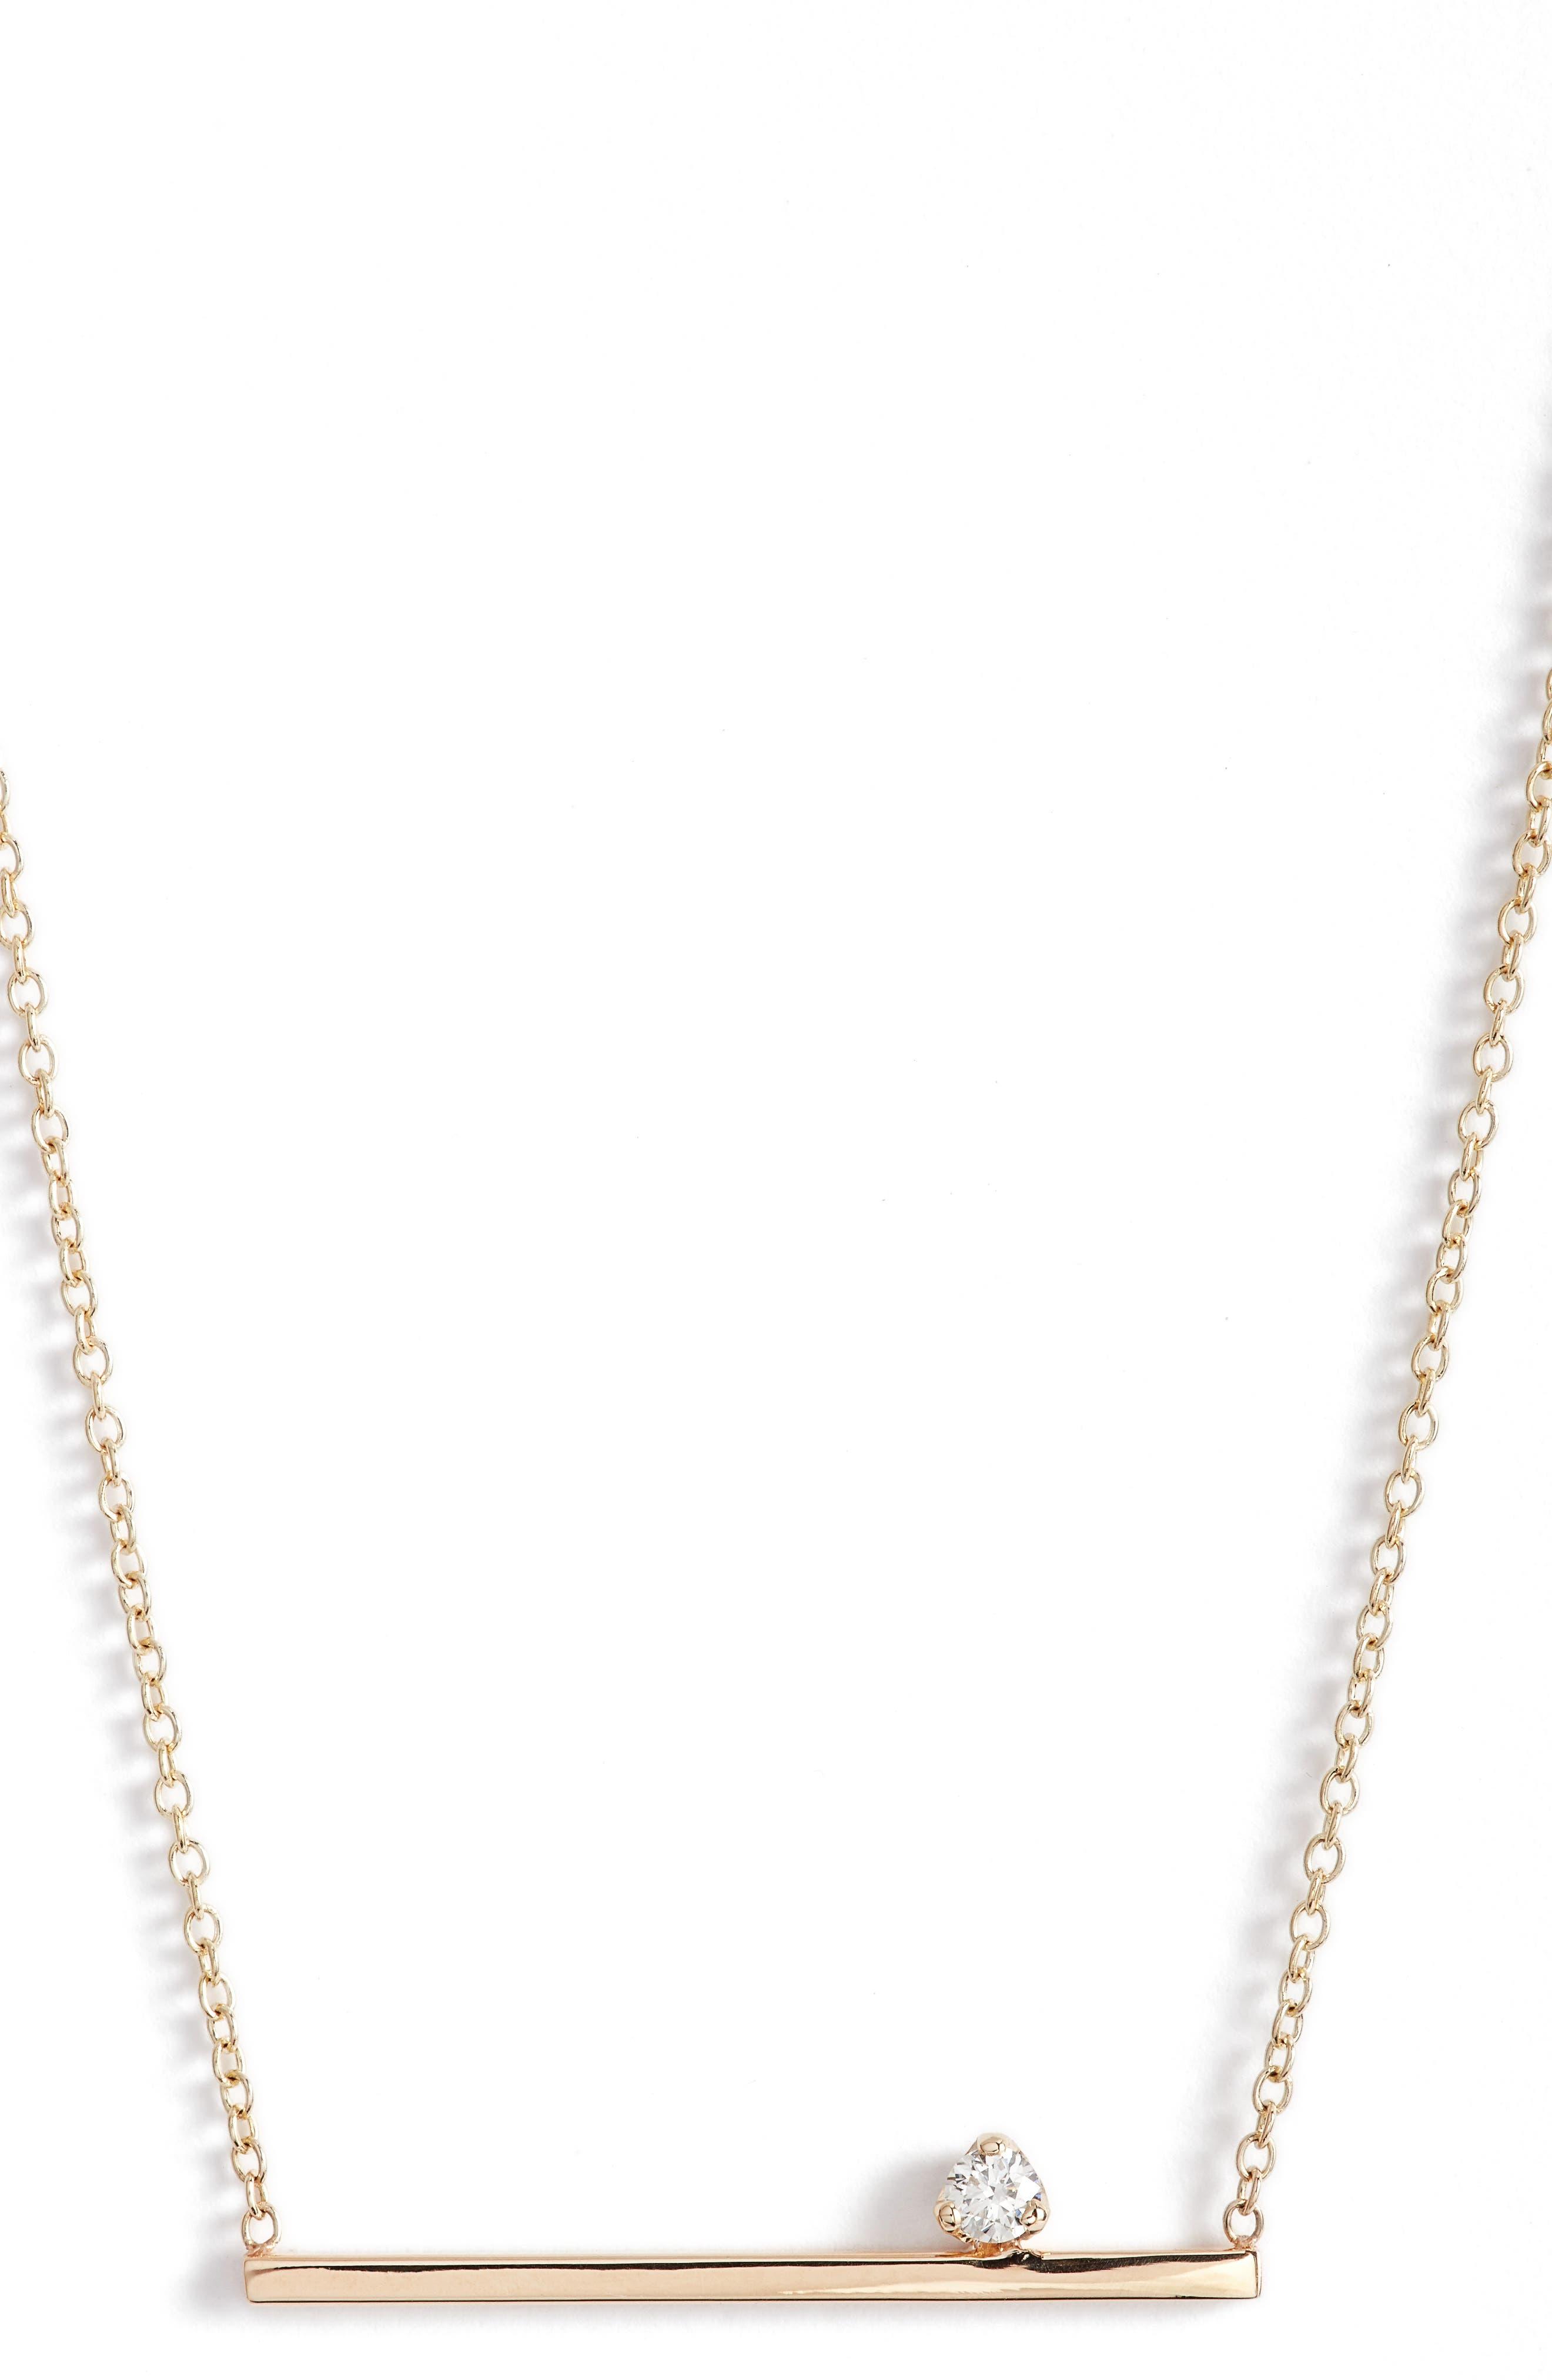 Floating Diamond Pendant Necklace,                             Main thumbnail 1, color,                             710